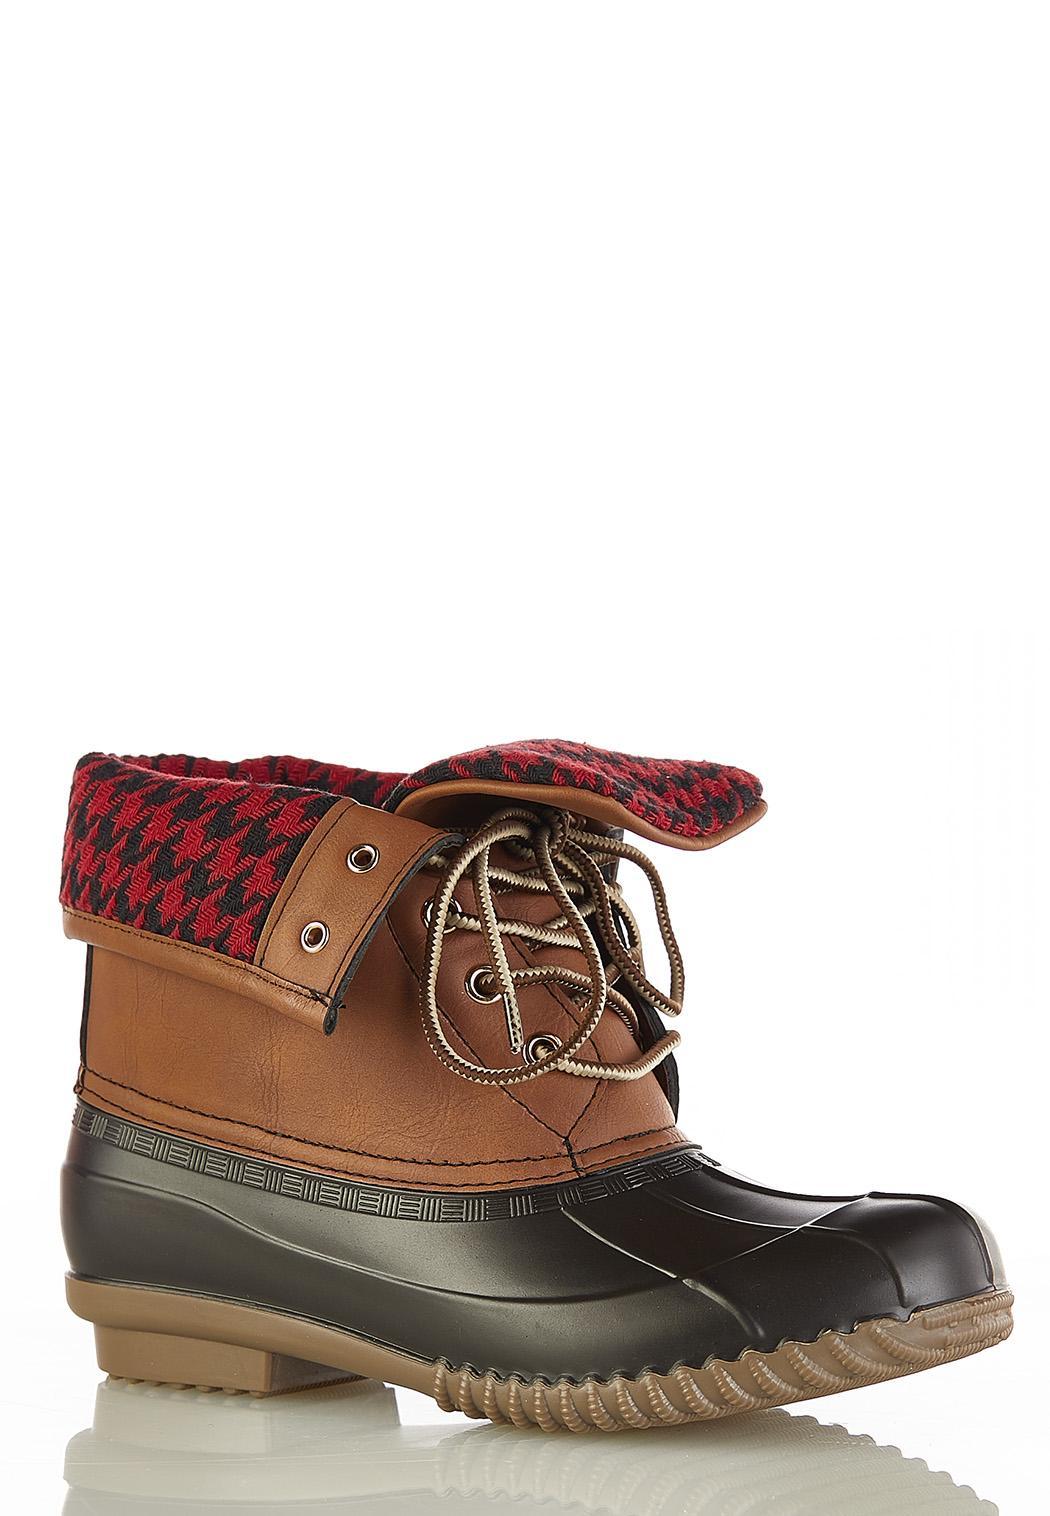 Buffalo Plaid Cuff Duck Boots